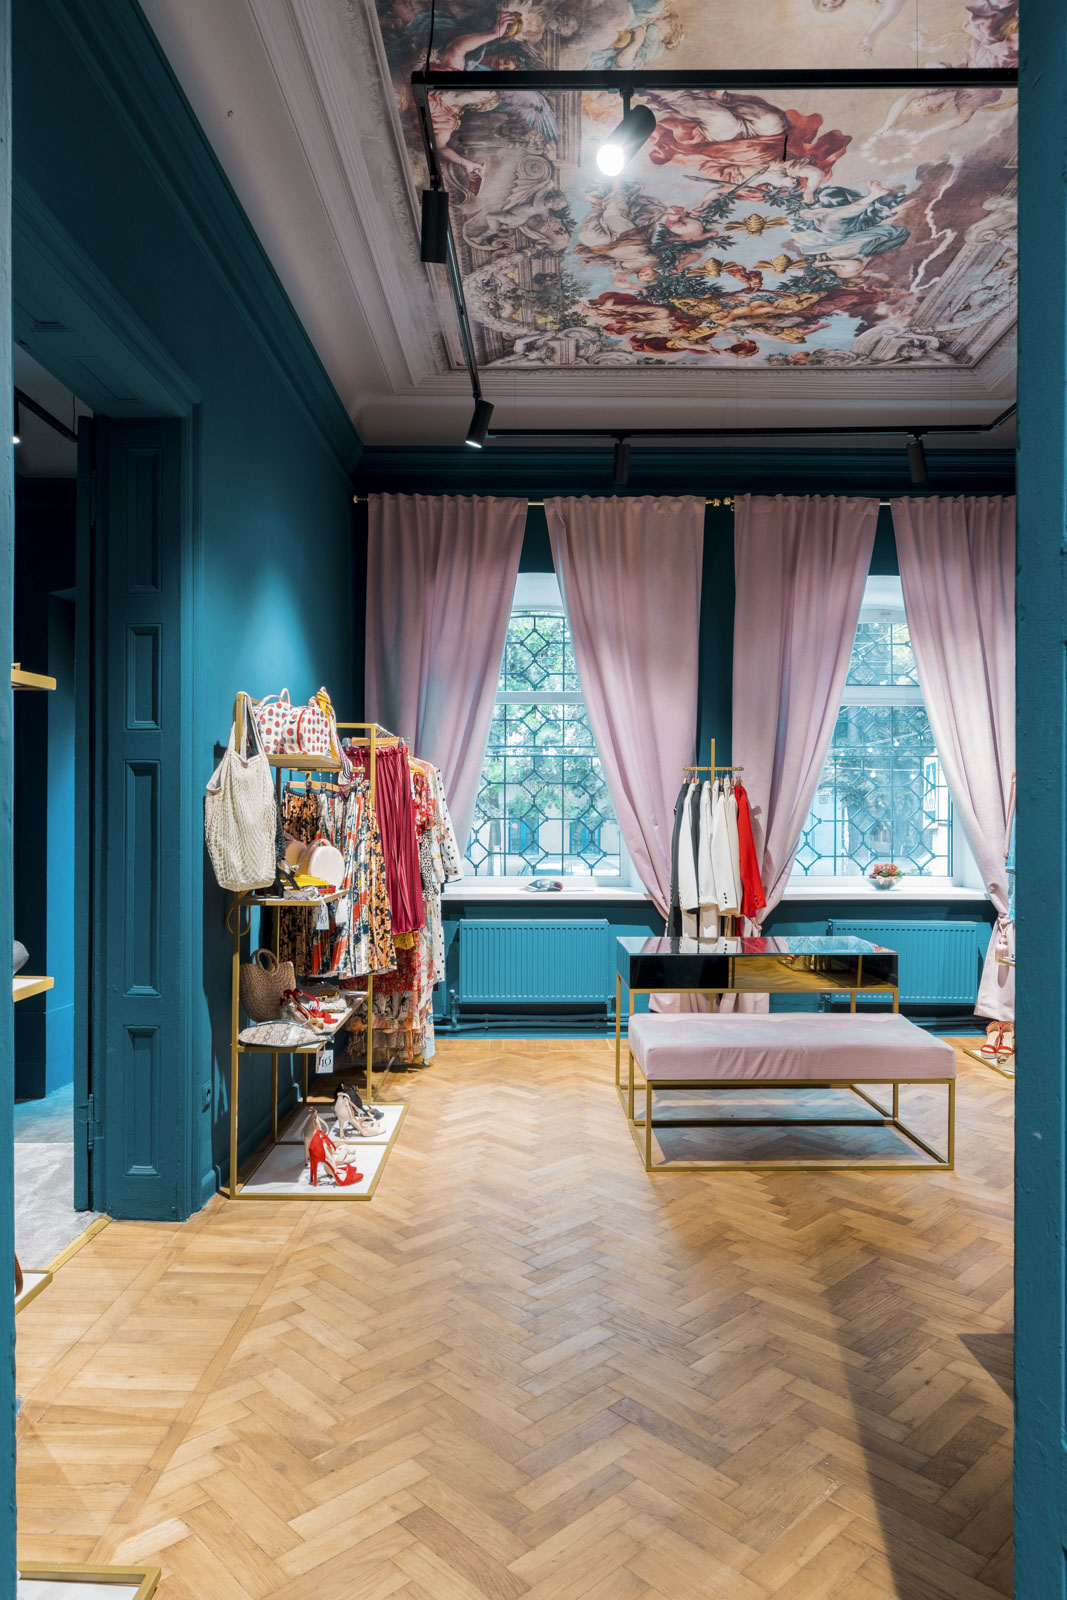 design interior magazin de haine Moldova Chisinau